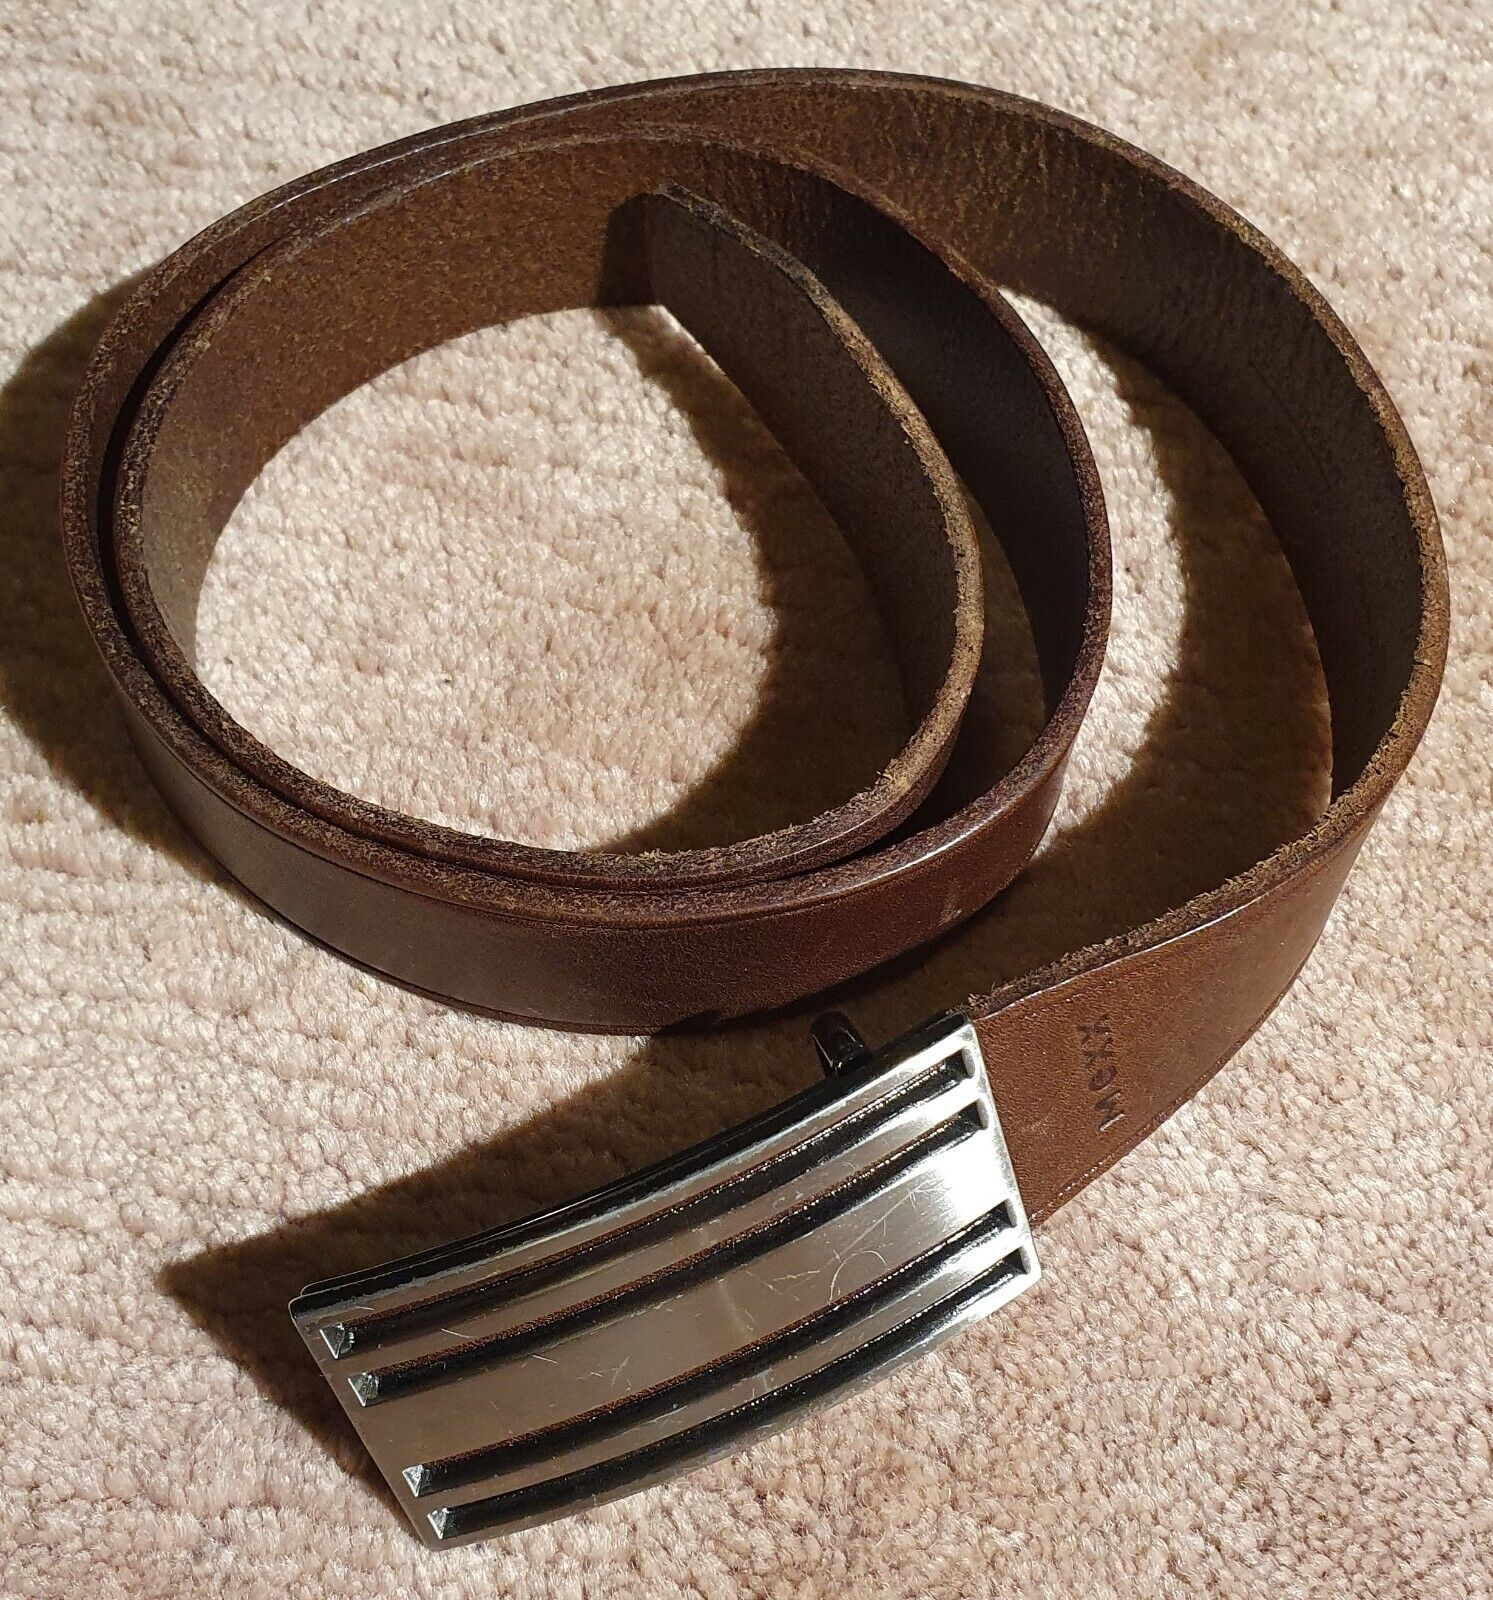 Herren Ledergürtel braun MEXX 3,5 cm breit 108 cm lang Echt Leder Gürtel